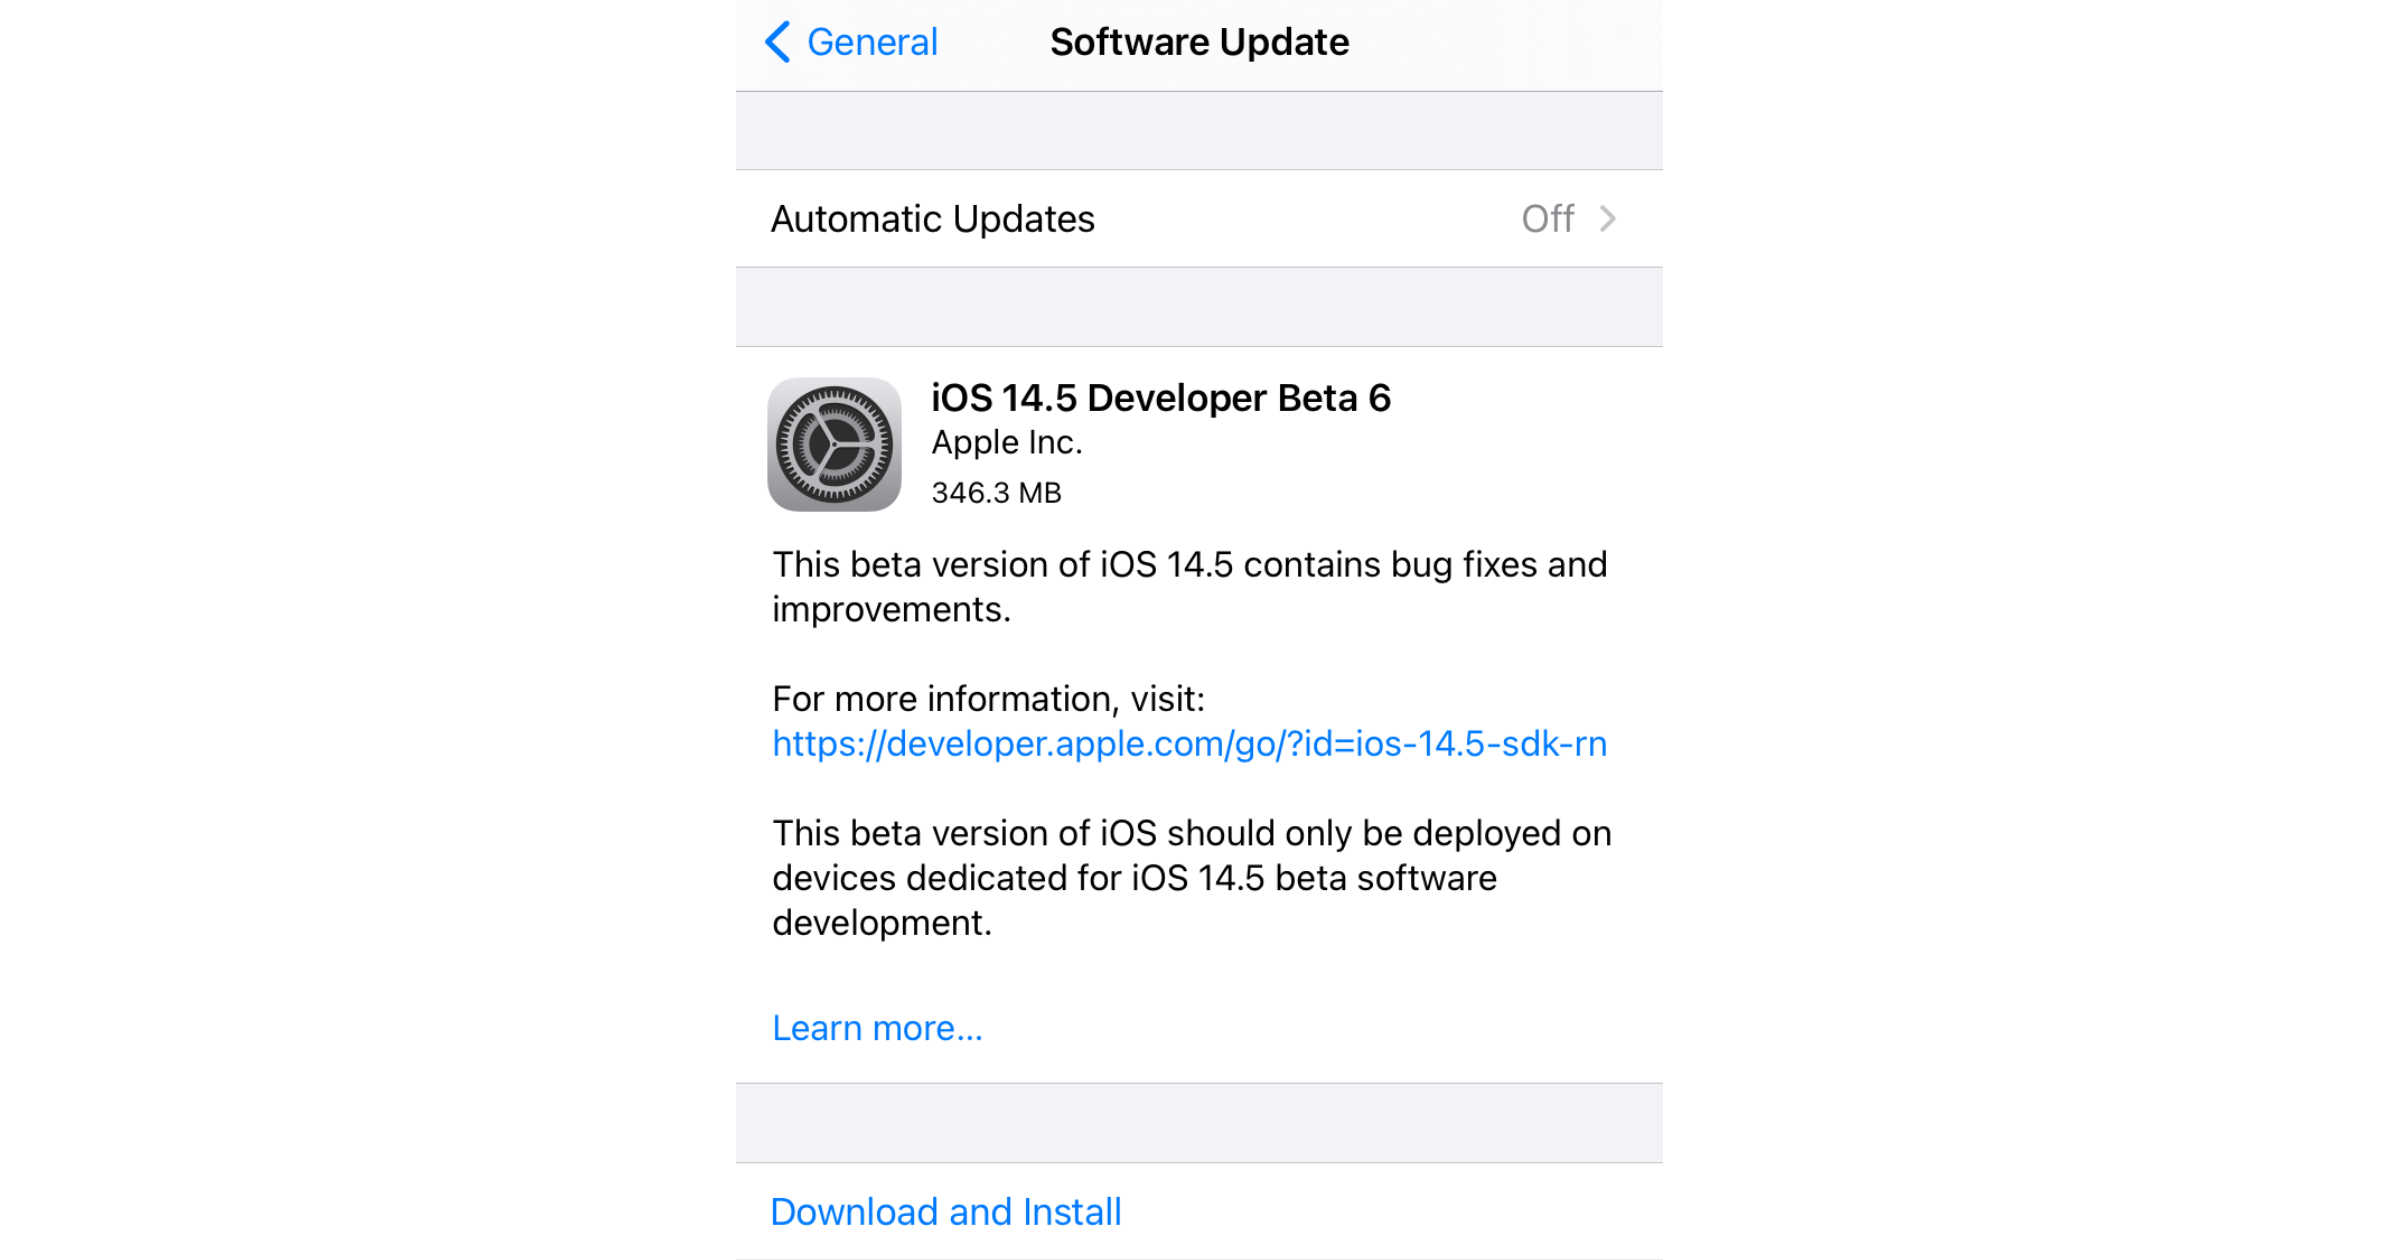 iOS 14.5 developer beta 6